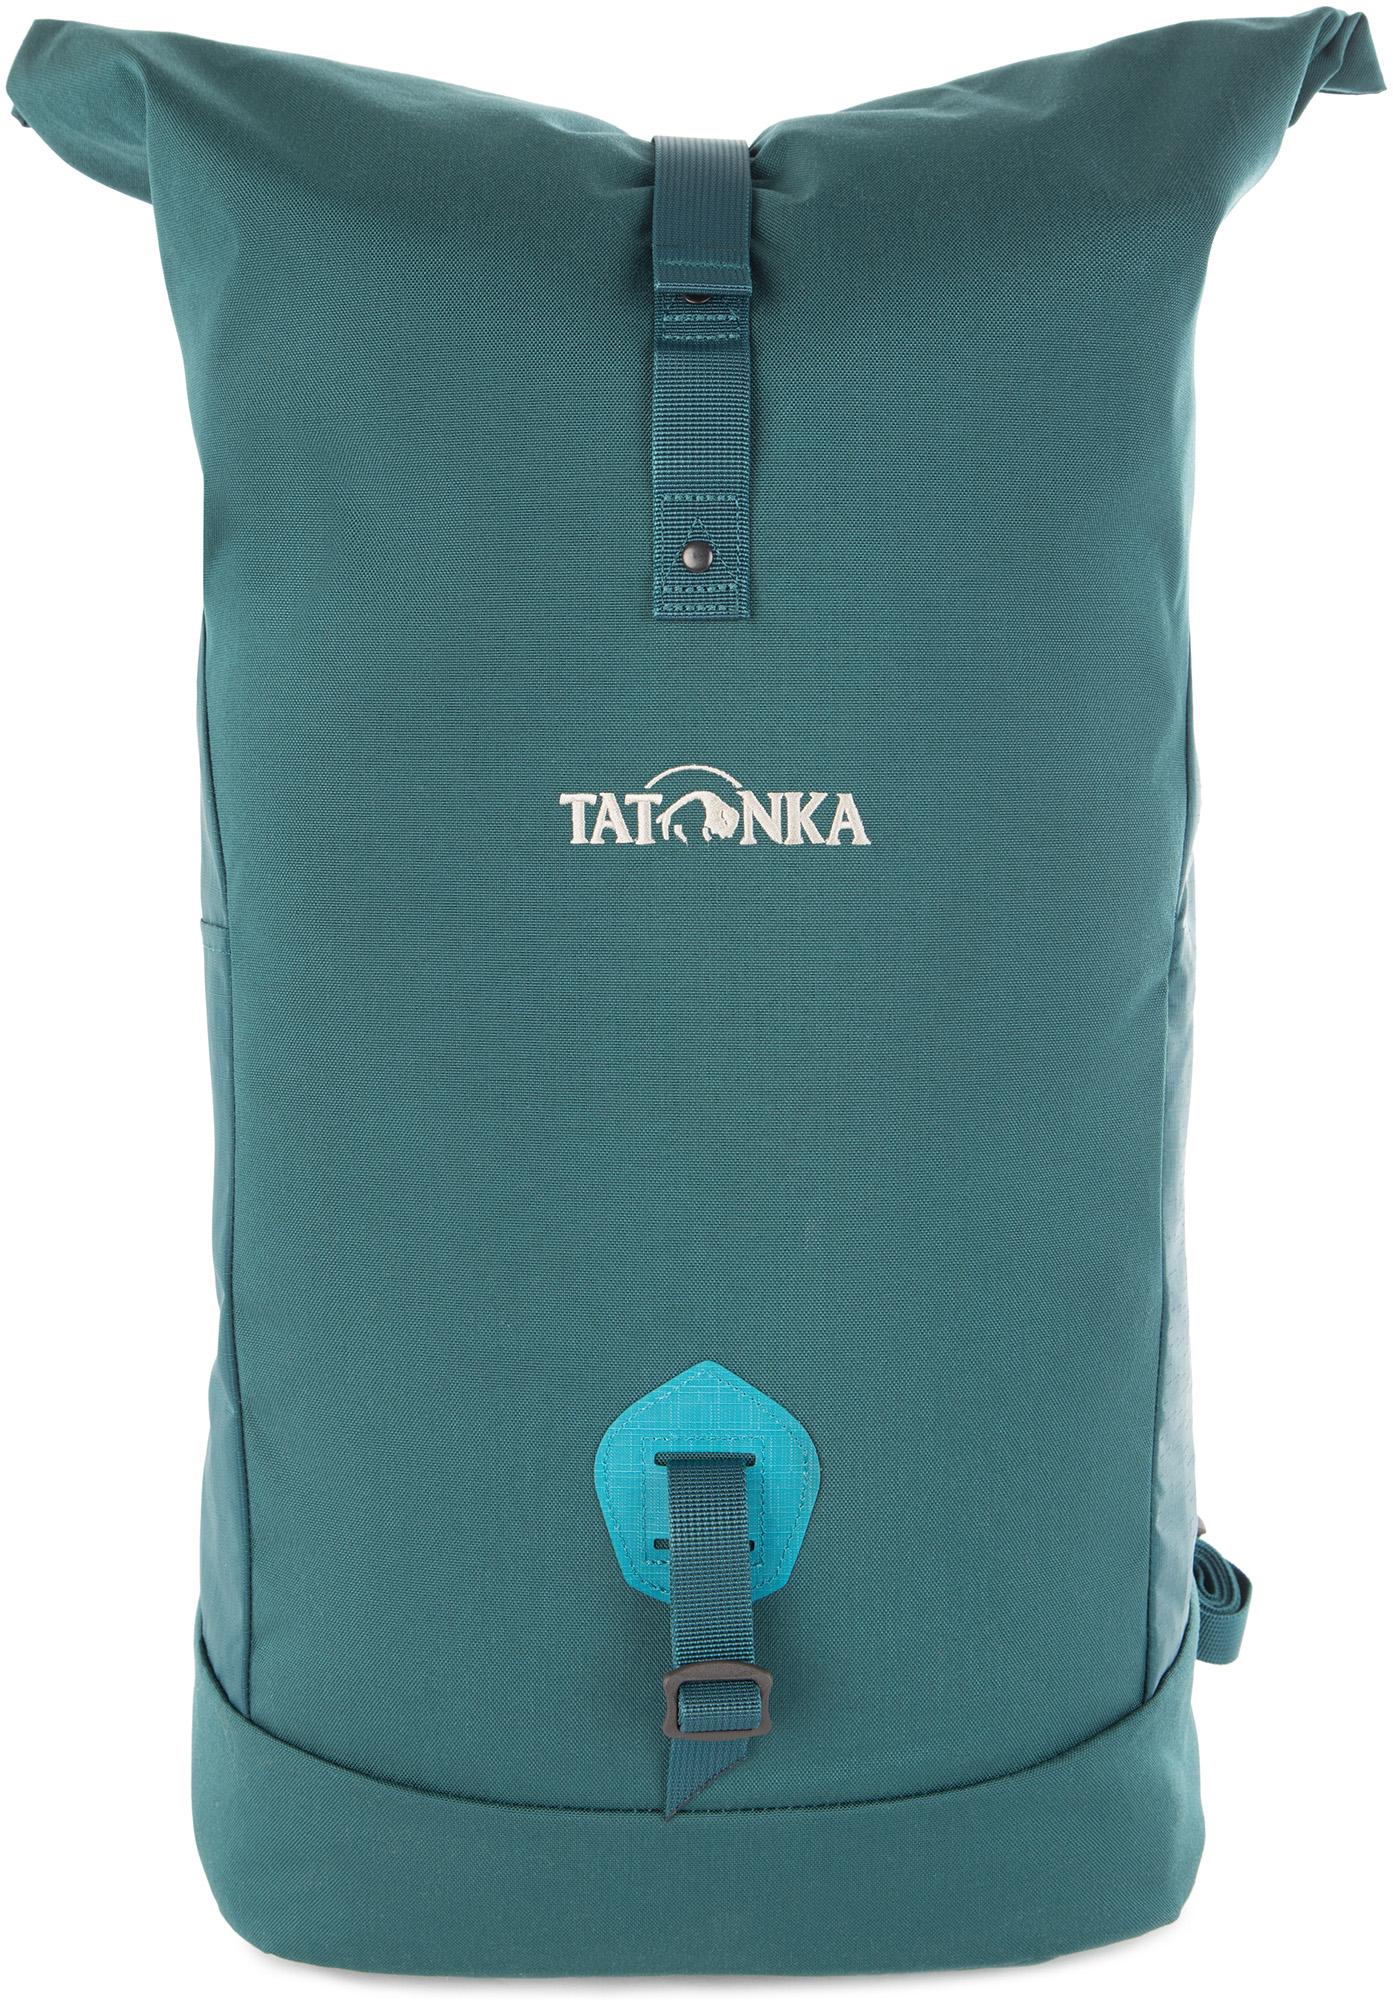 Tatonka Tatonka Grip Rolltop Pack S tatonka sparrow pack 19 women